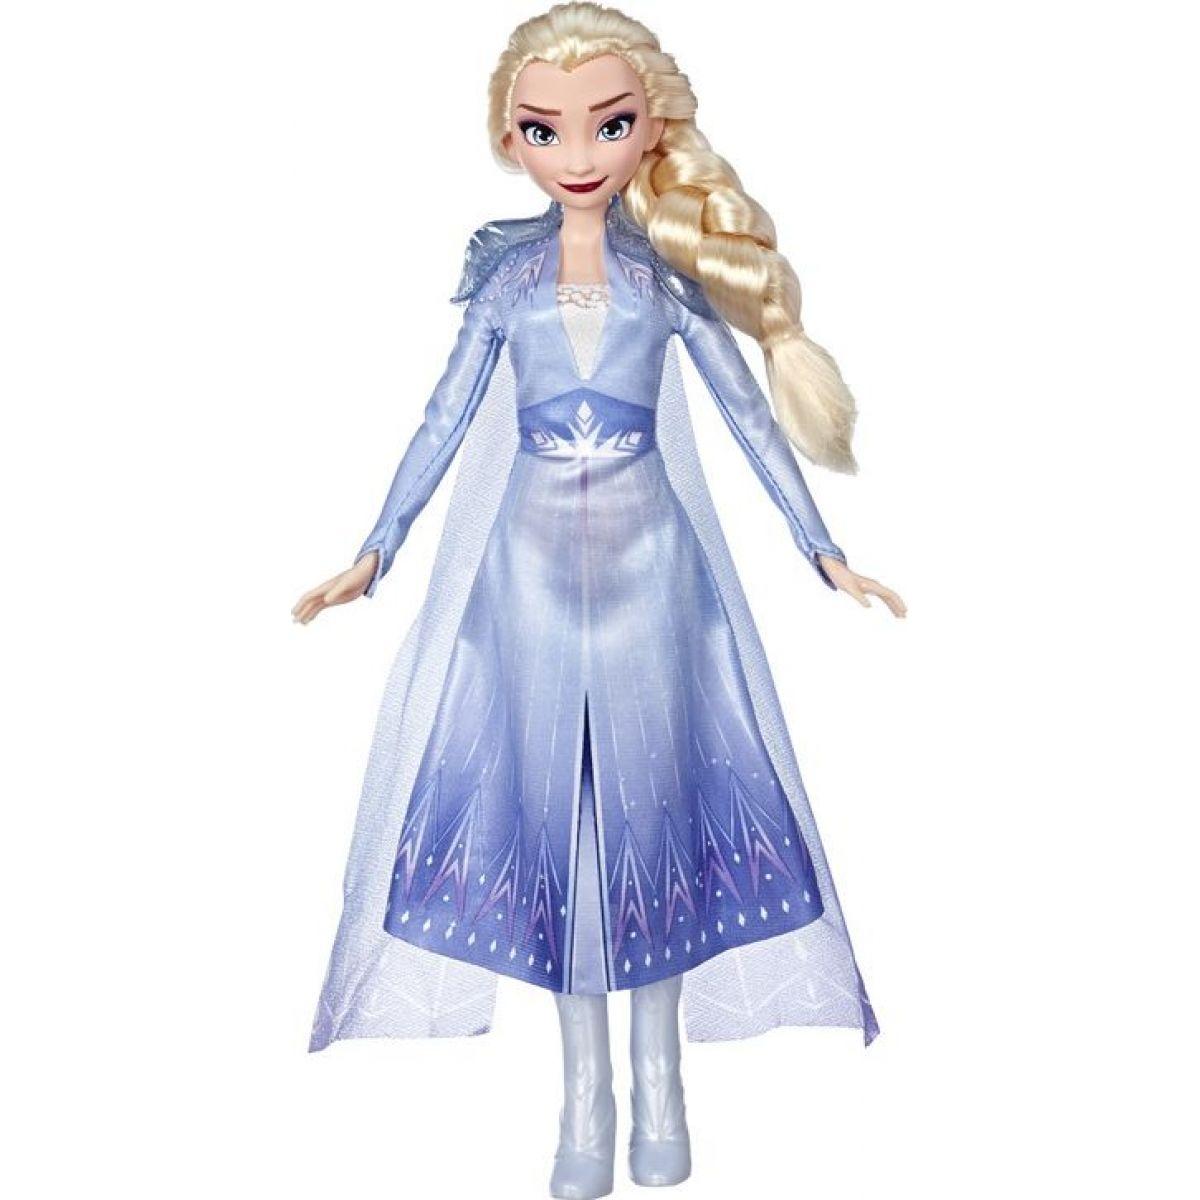 Hasbro Frozen 2 Panenka Elsa